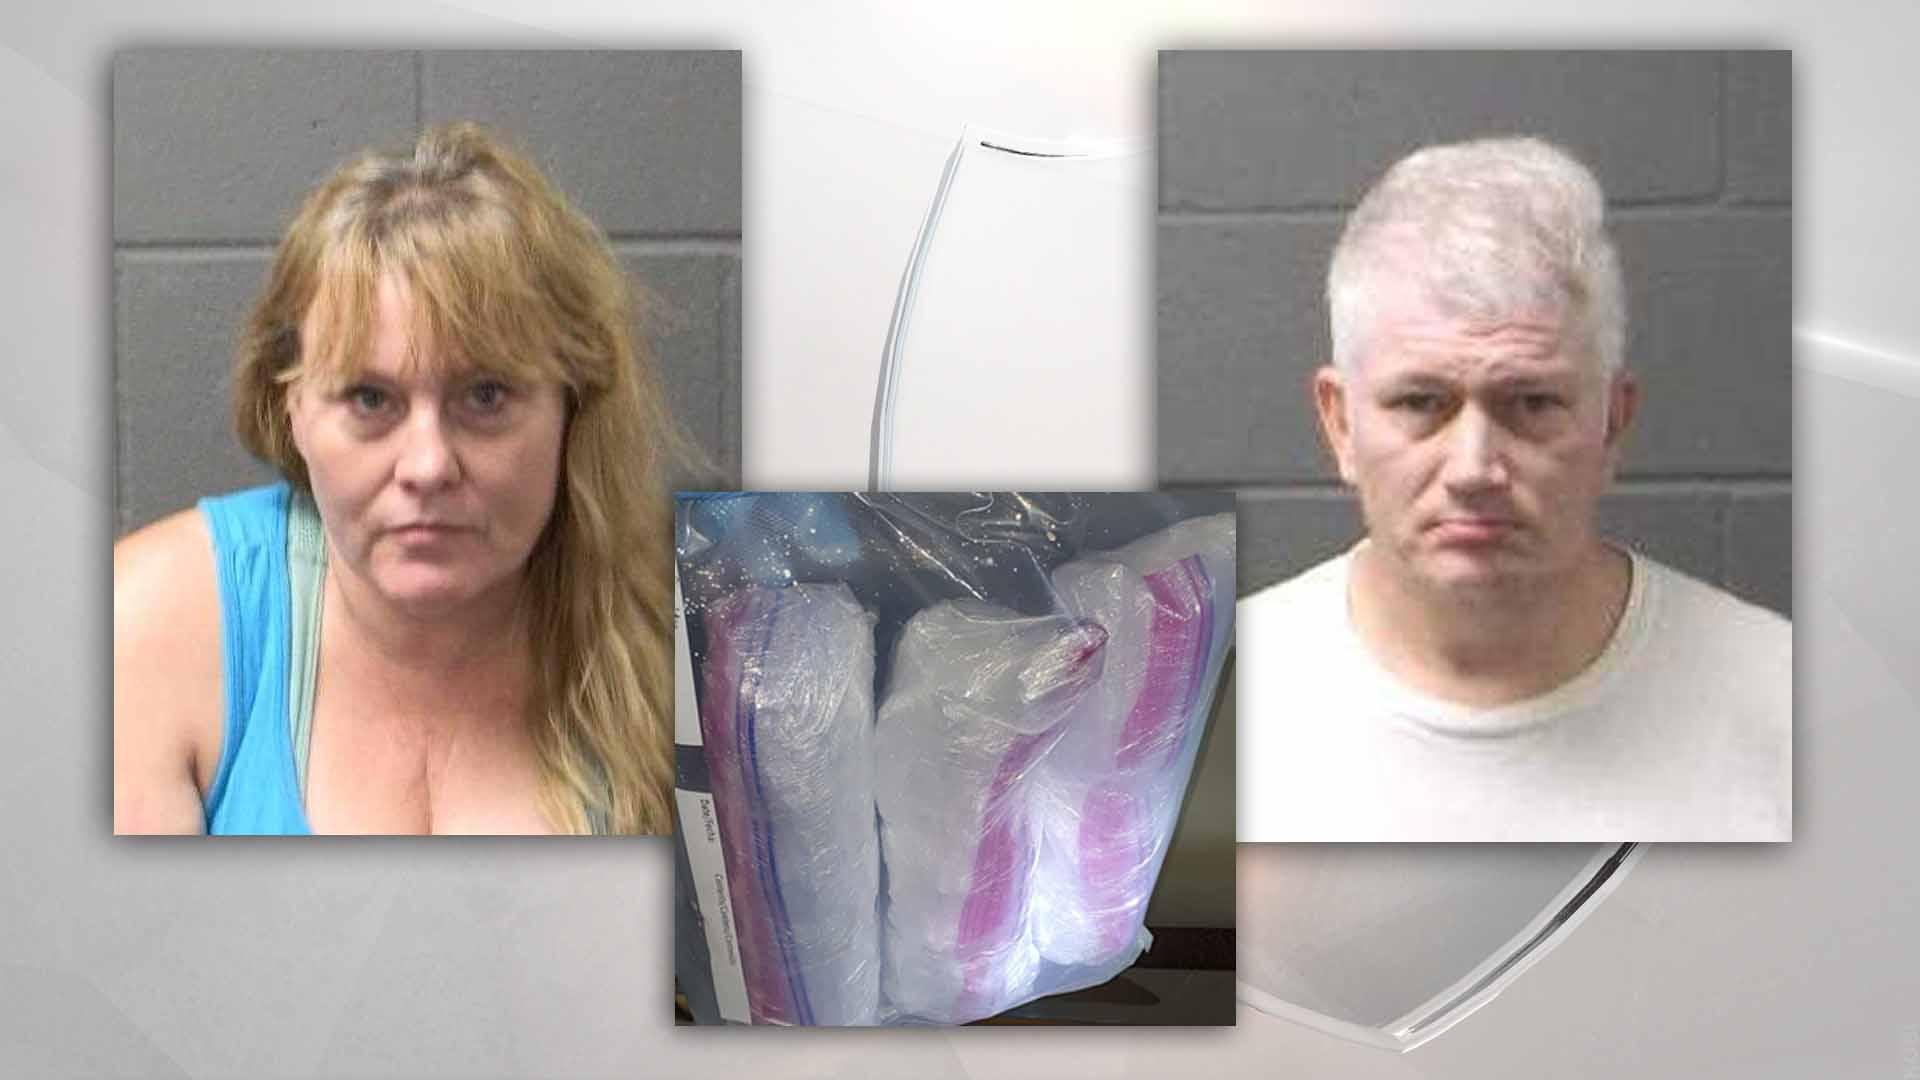 Suspects found with 8 pounds of meth, Klamath Falls police say - KOBI-TV NBC5 / KOTI-TV NBC2